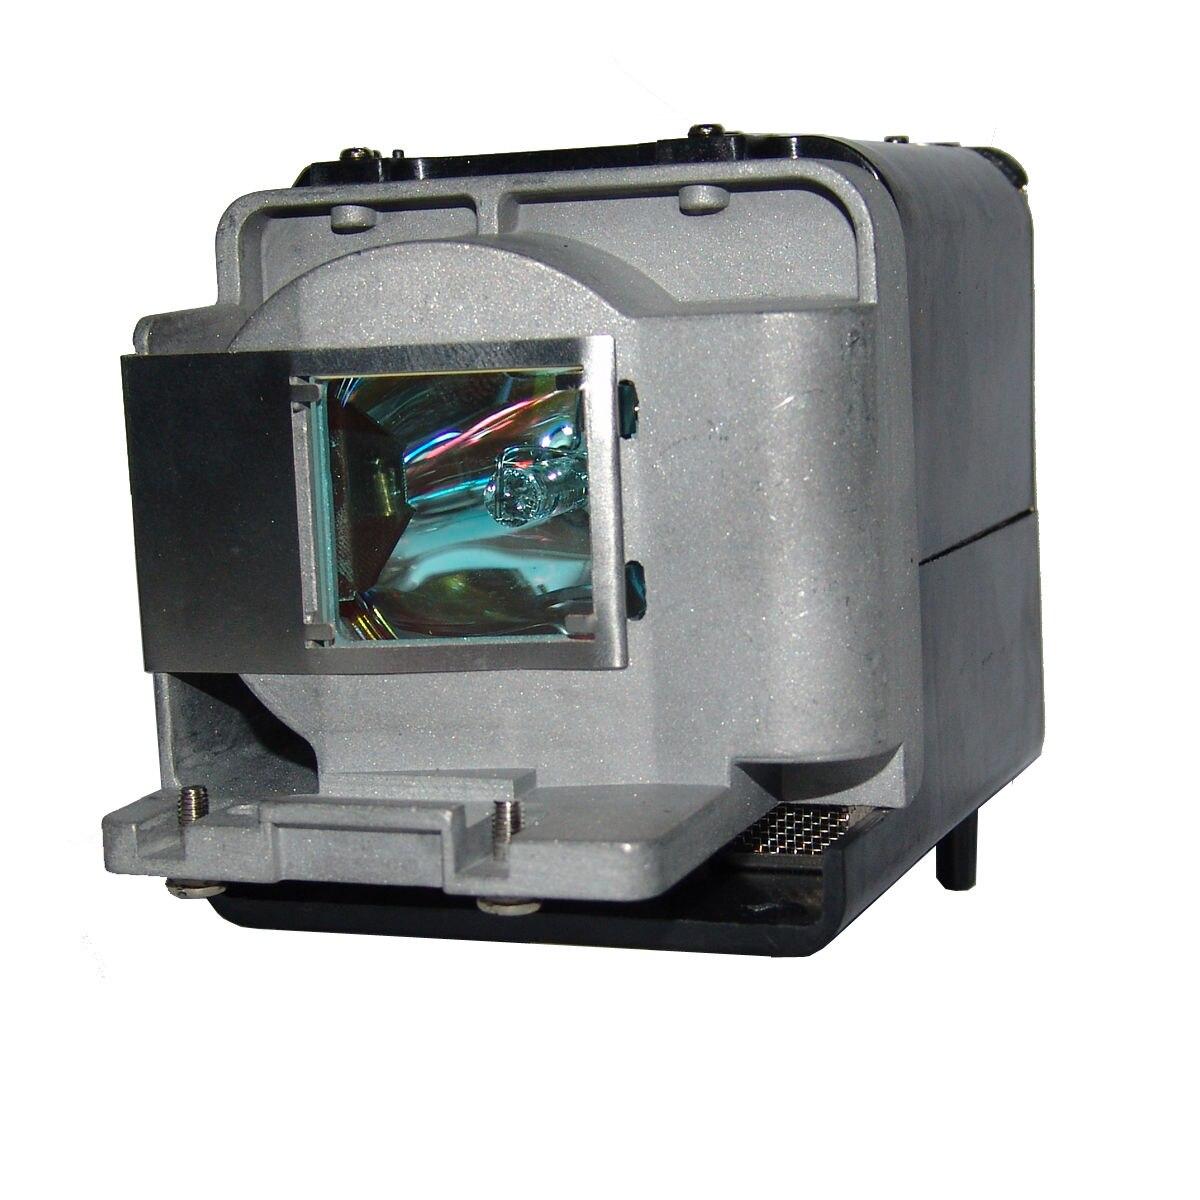 Projector Lamp Bulb SP-LAMP-078 SPLAMP078 for Infocus IN3124 IN3126 IN3128HD with housing флягодержатель merida cl 078 пластик бело зеленый 2124002578